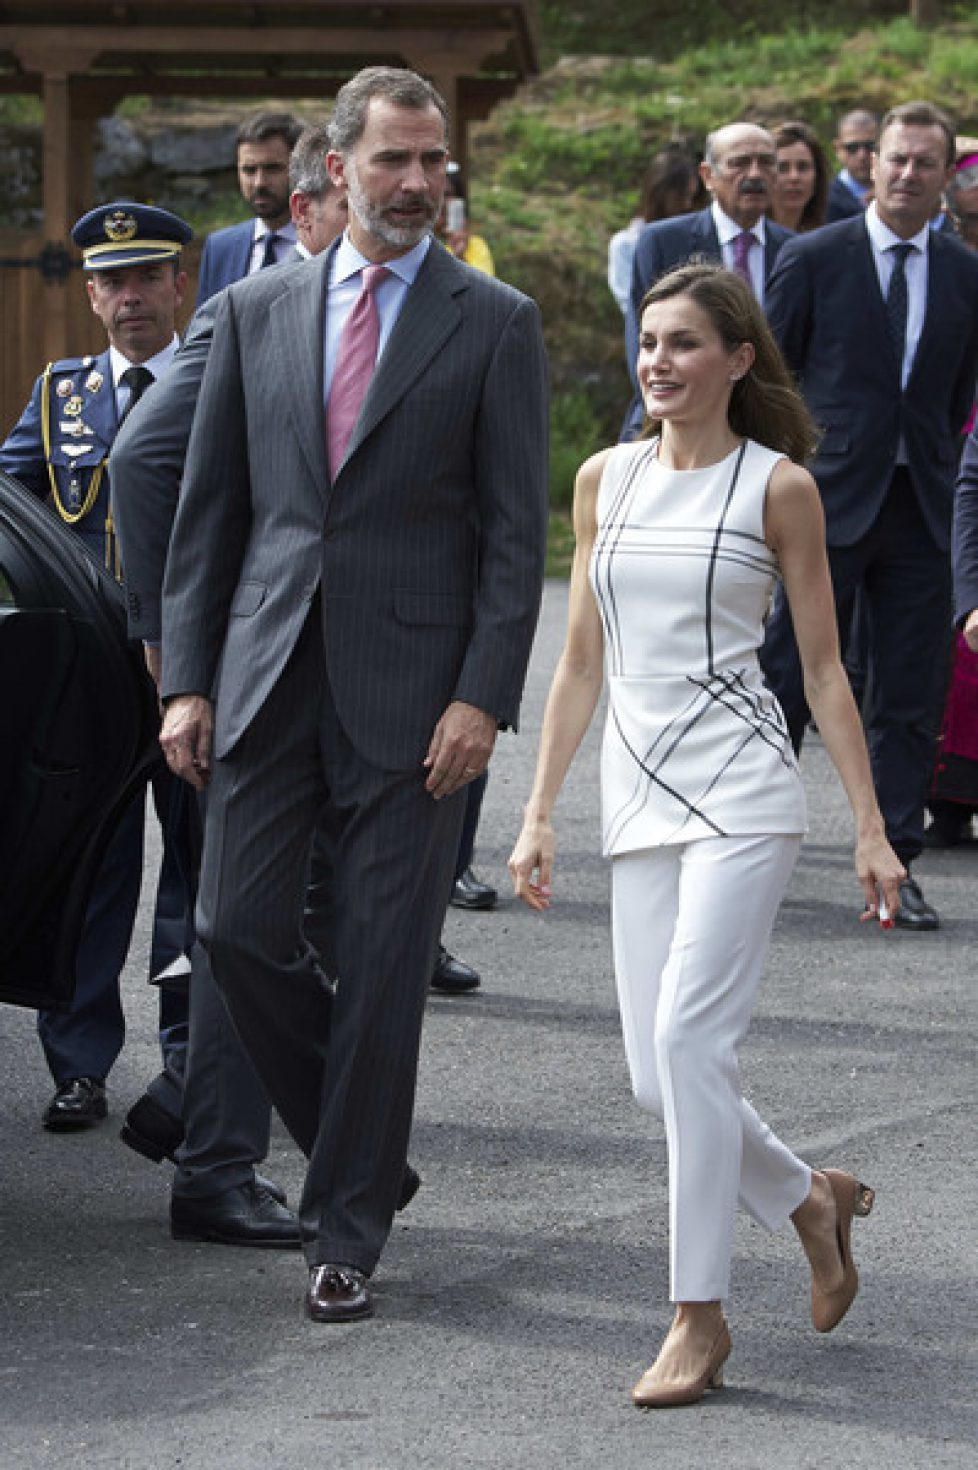 Spanish+Royals+Visit+Santo+Toribio+De+Liebana+8zi6Kz9yPHql